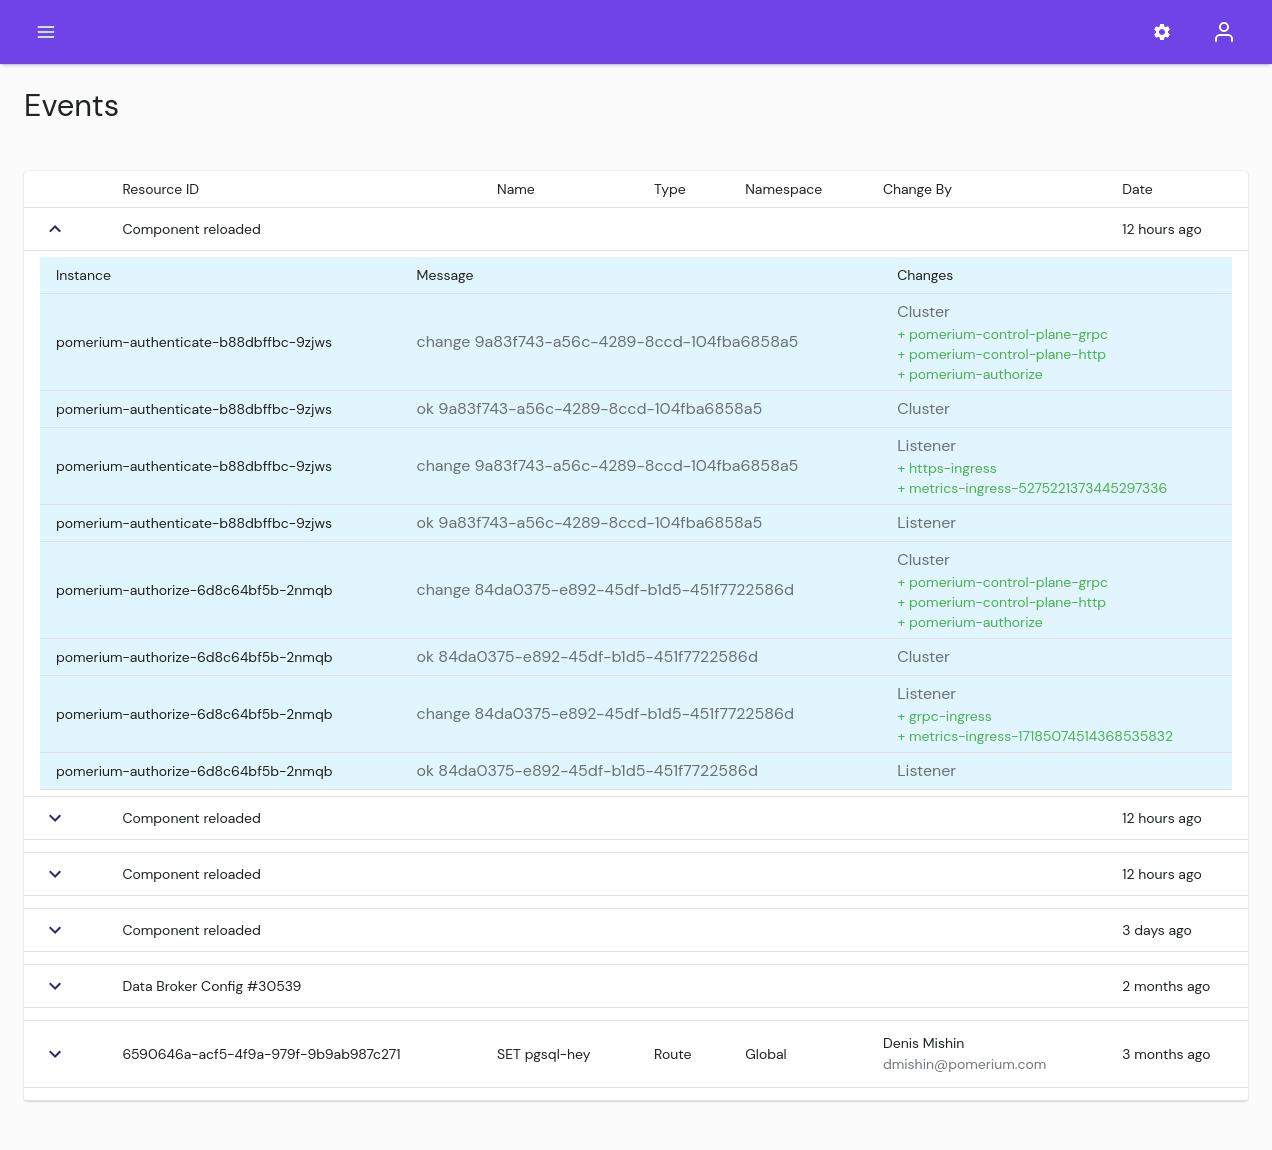 The Events page in Pomerium Enterprise